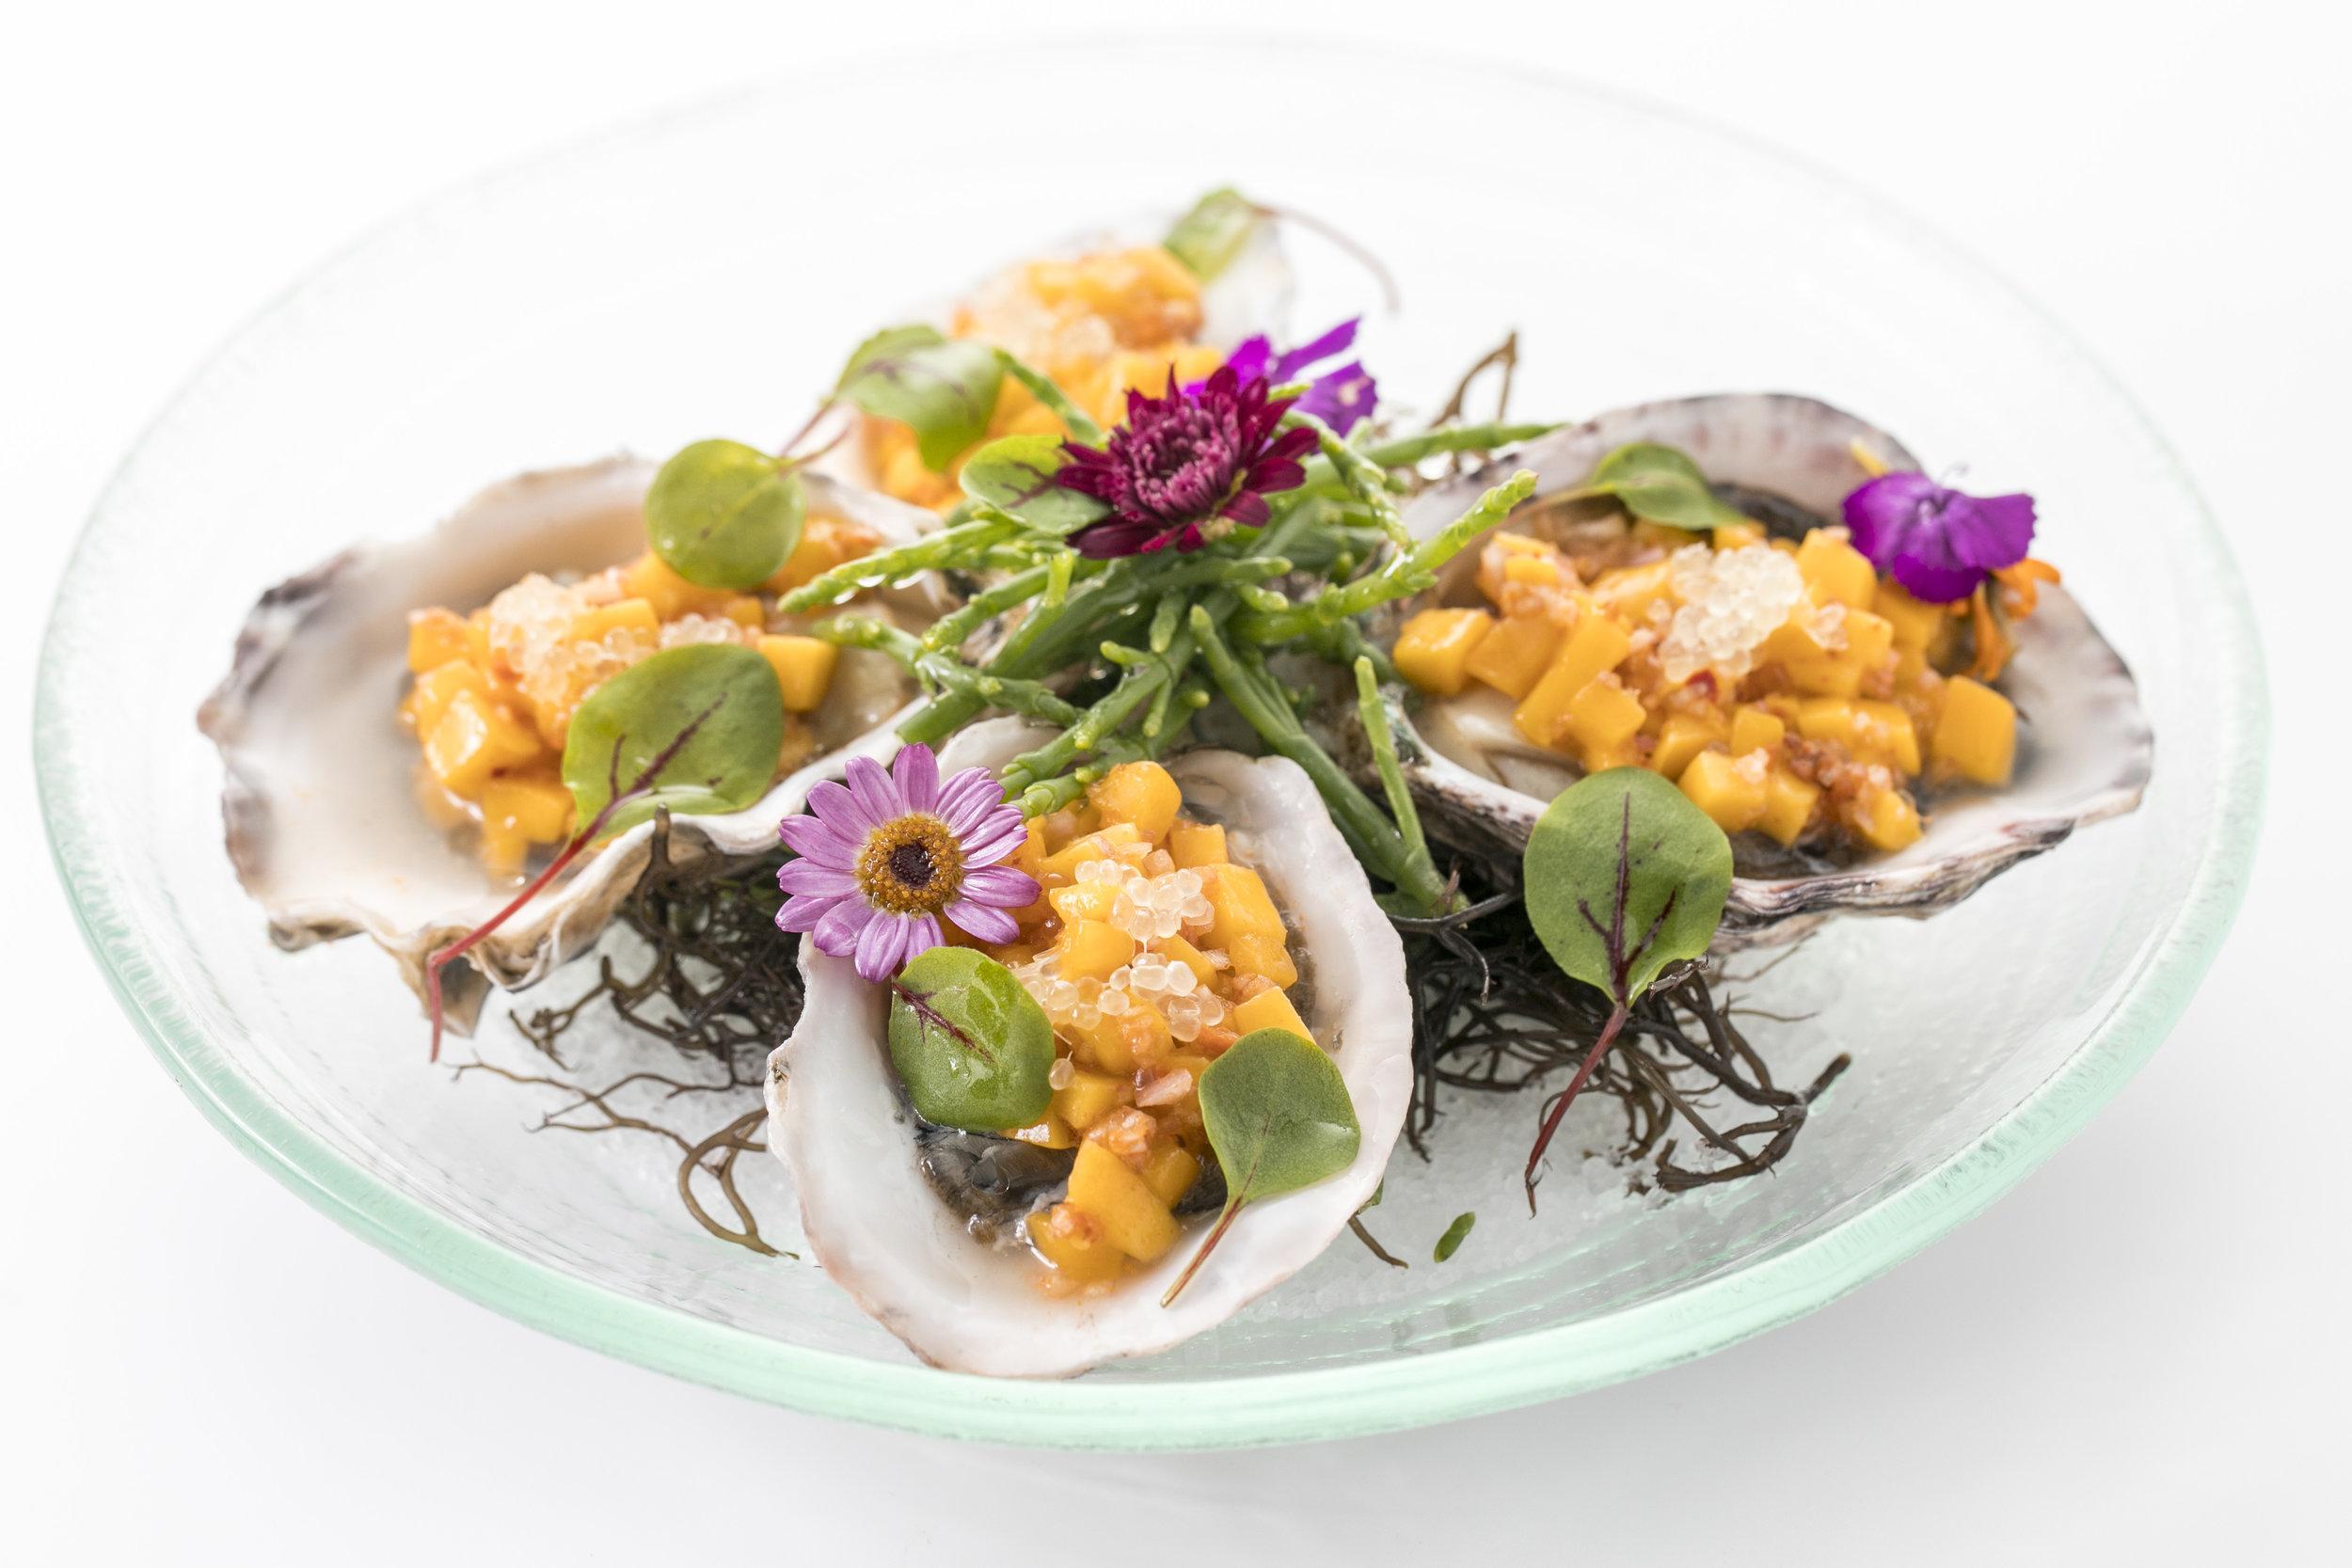 Oyster Mignonette オイスター・ミニョネッテ($24)   新鮮なファニーベイ・オイスター4個にイタリア、カラブリア産のポークサラミスプレッドとシーアスパラガスやオゴを乗せ、仕上げに食用フラワーをトッピング。食材の持つ自然の甘みと滋味、塩味が絶妙な逸品。1個$6で追加オーダーも可能。